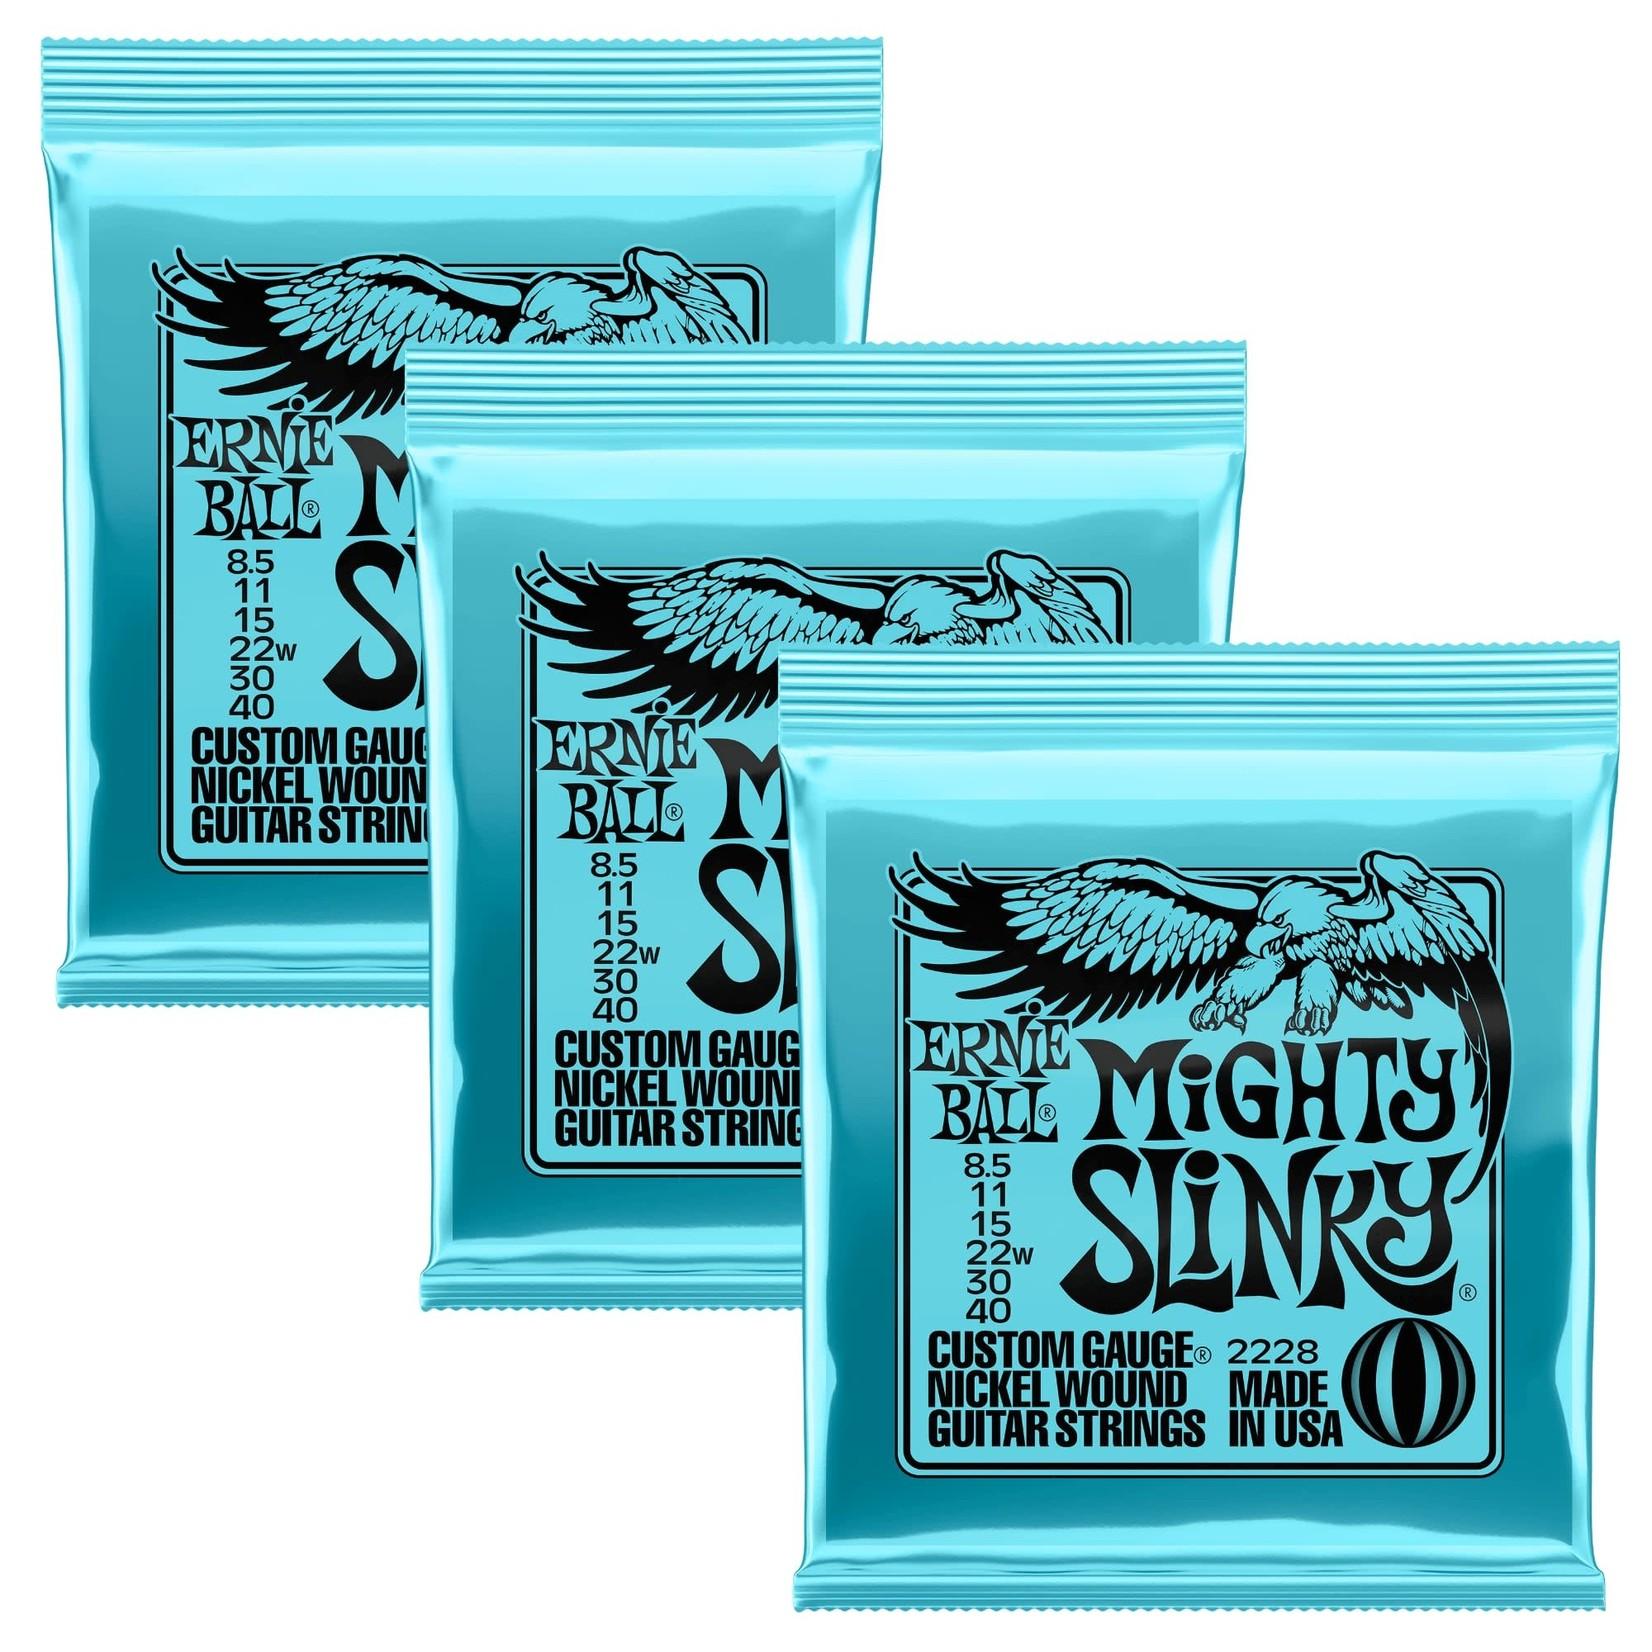 Ernie Ball 3x (3 sets) Ernie Ball Mighty Slinky Custom Gauge Nickel Wound Guitar Strings (8.5-40) (P02228)